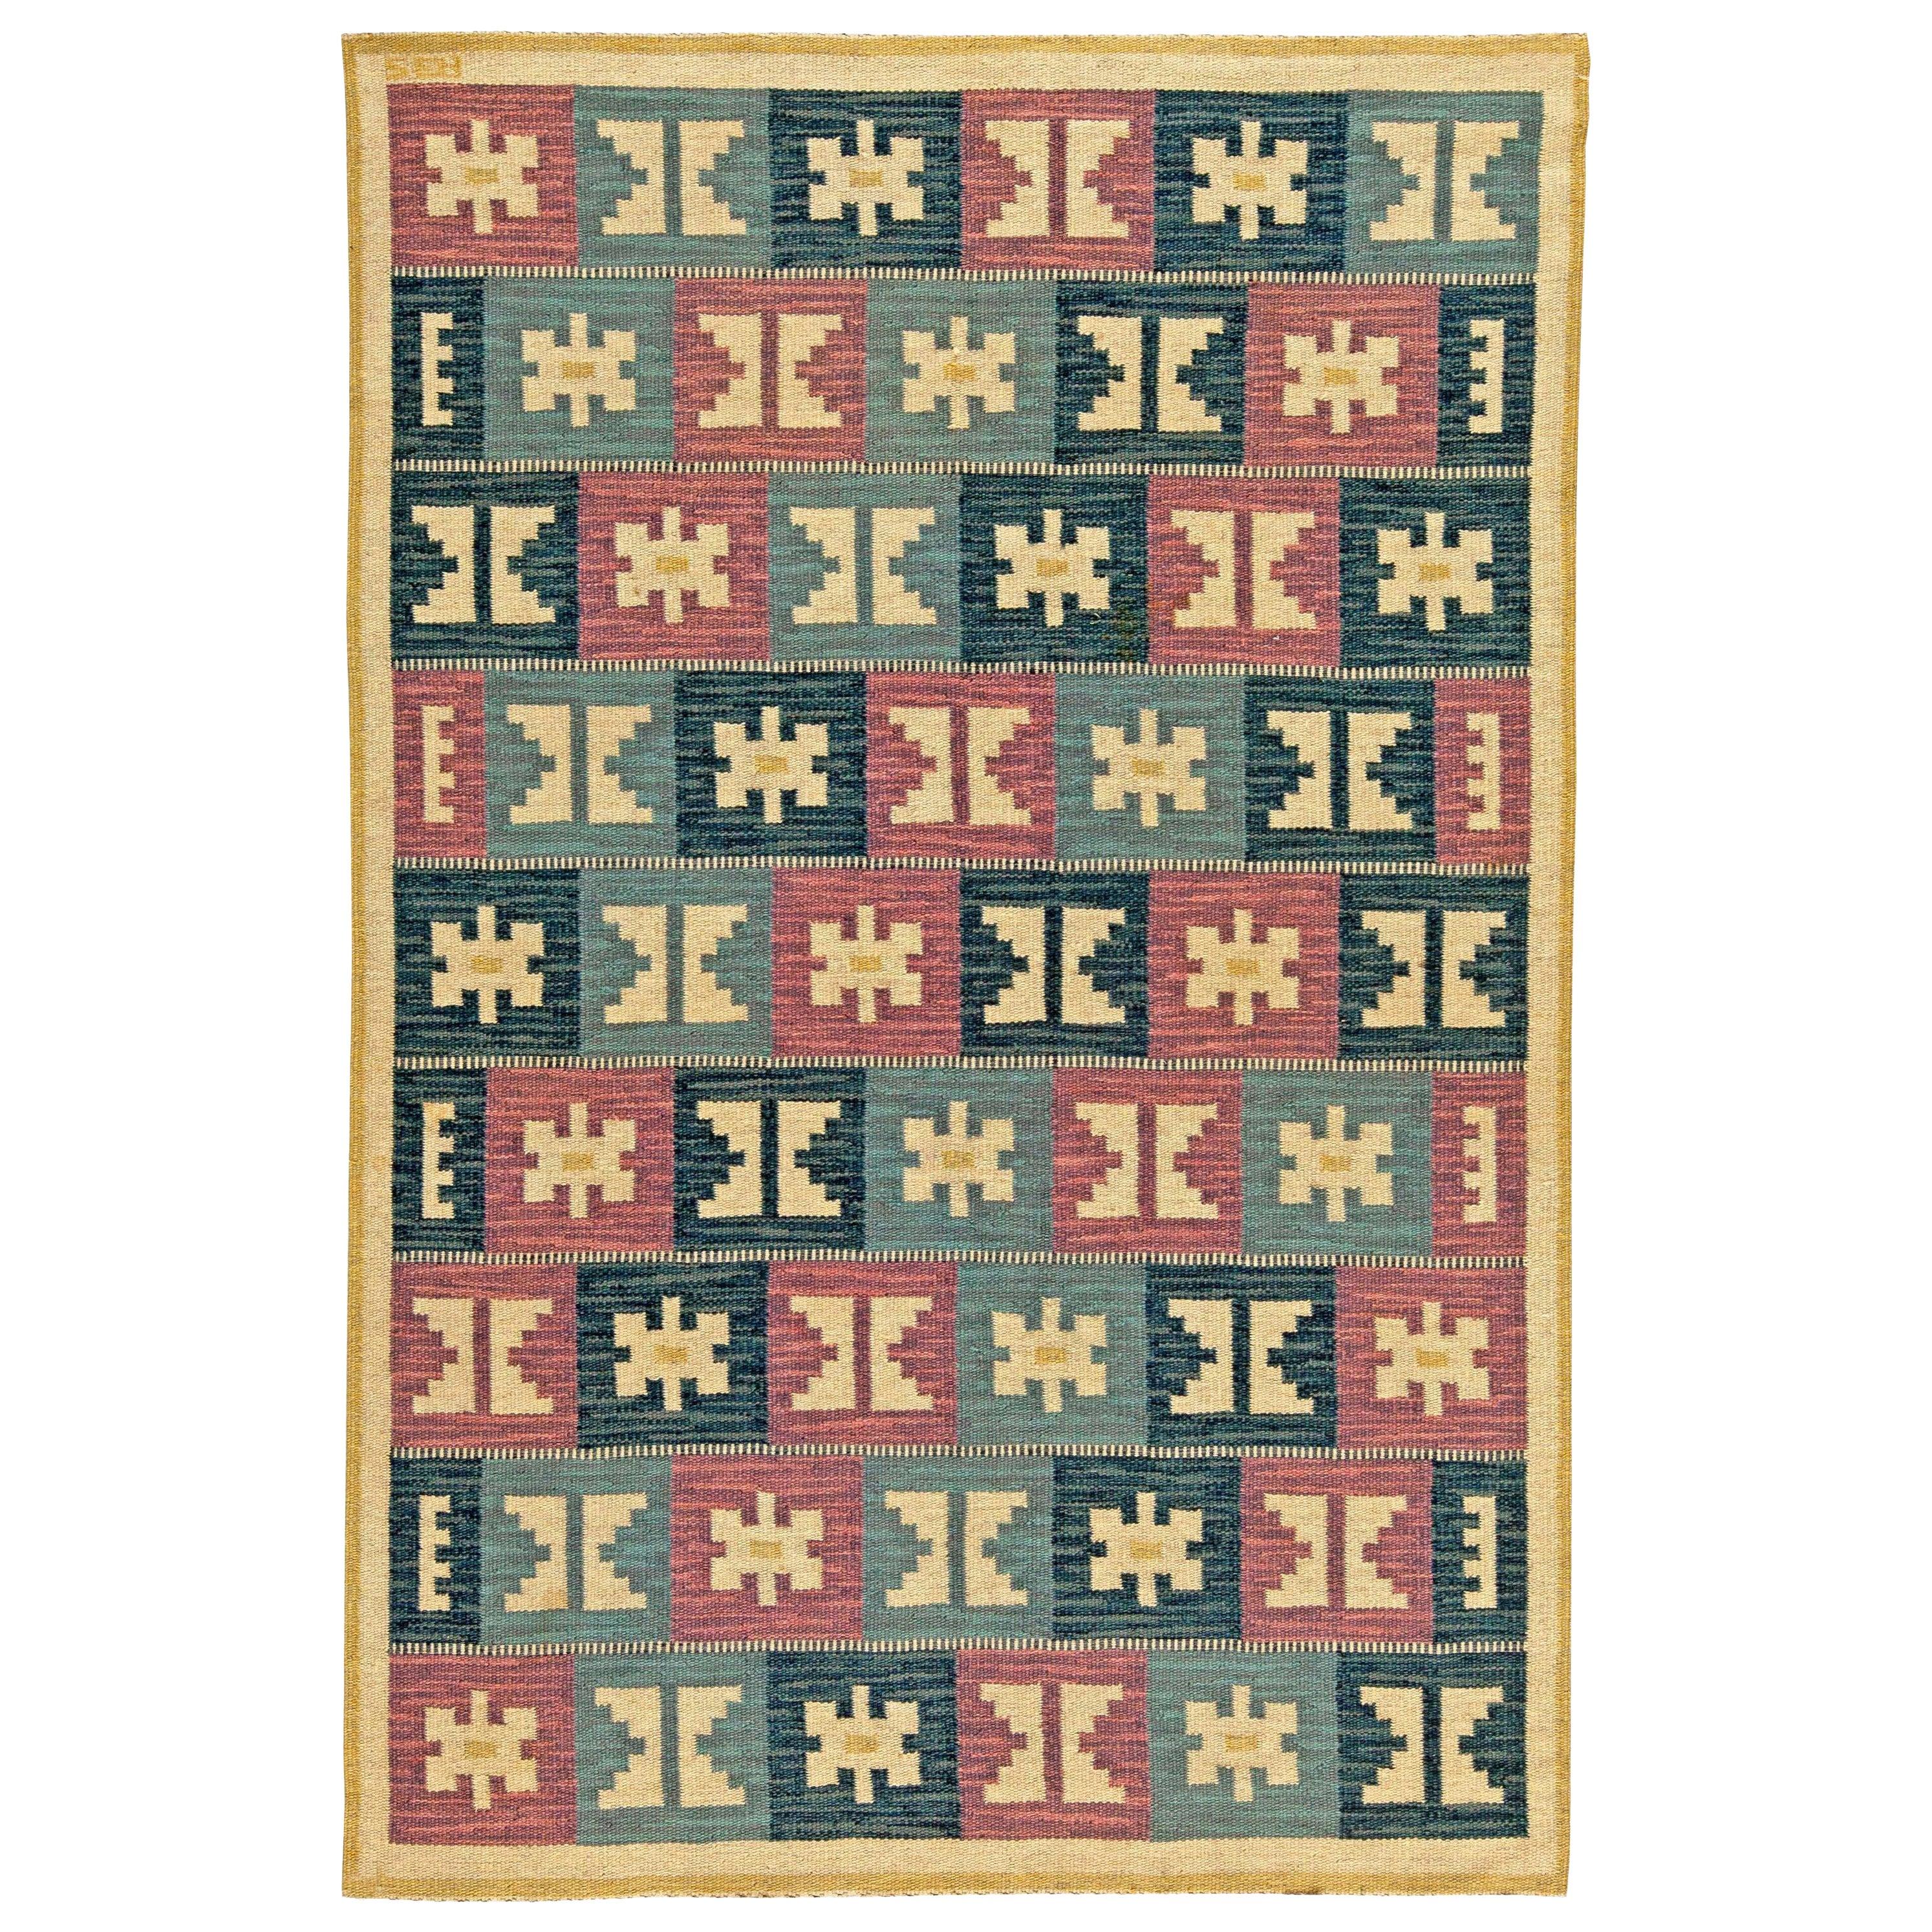 Midcentury Swedish Geometric Flat-Woven Wool by Anna-Greta Sjöqvist